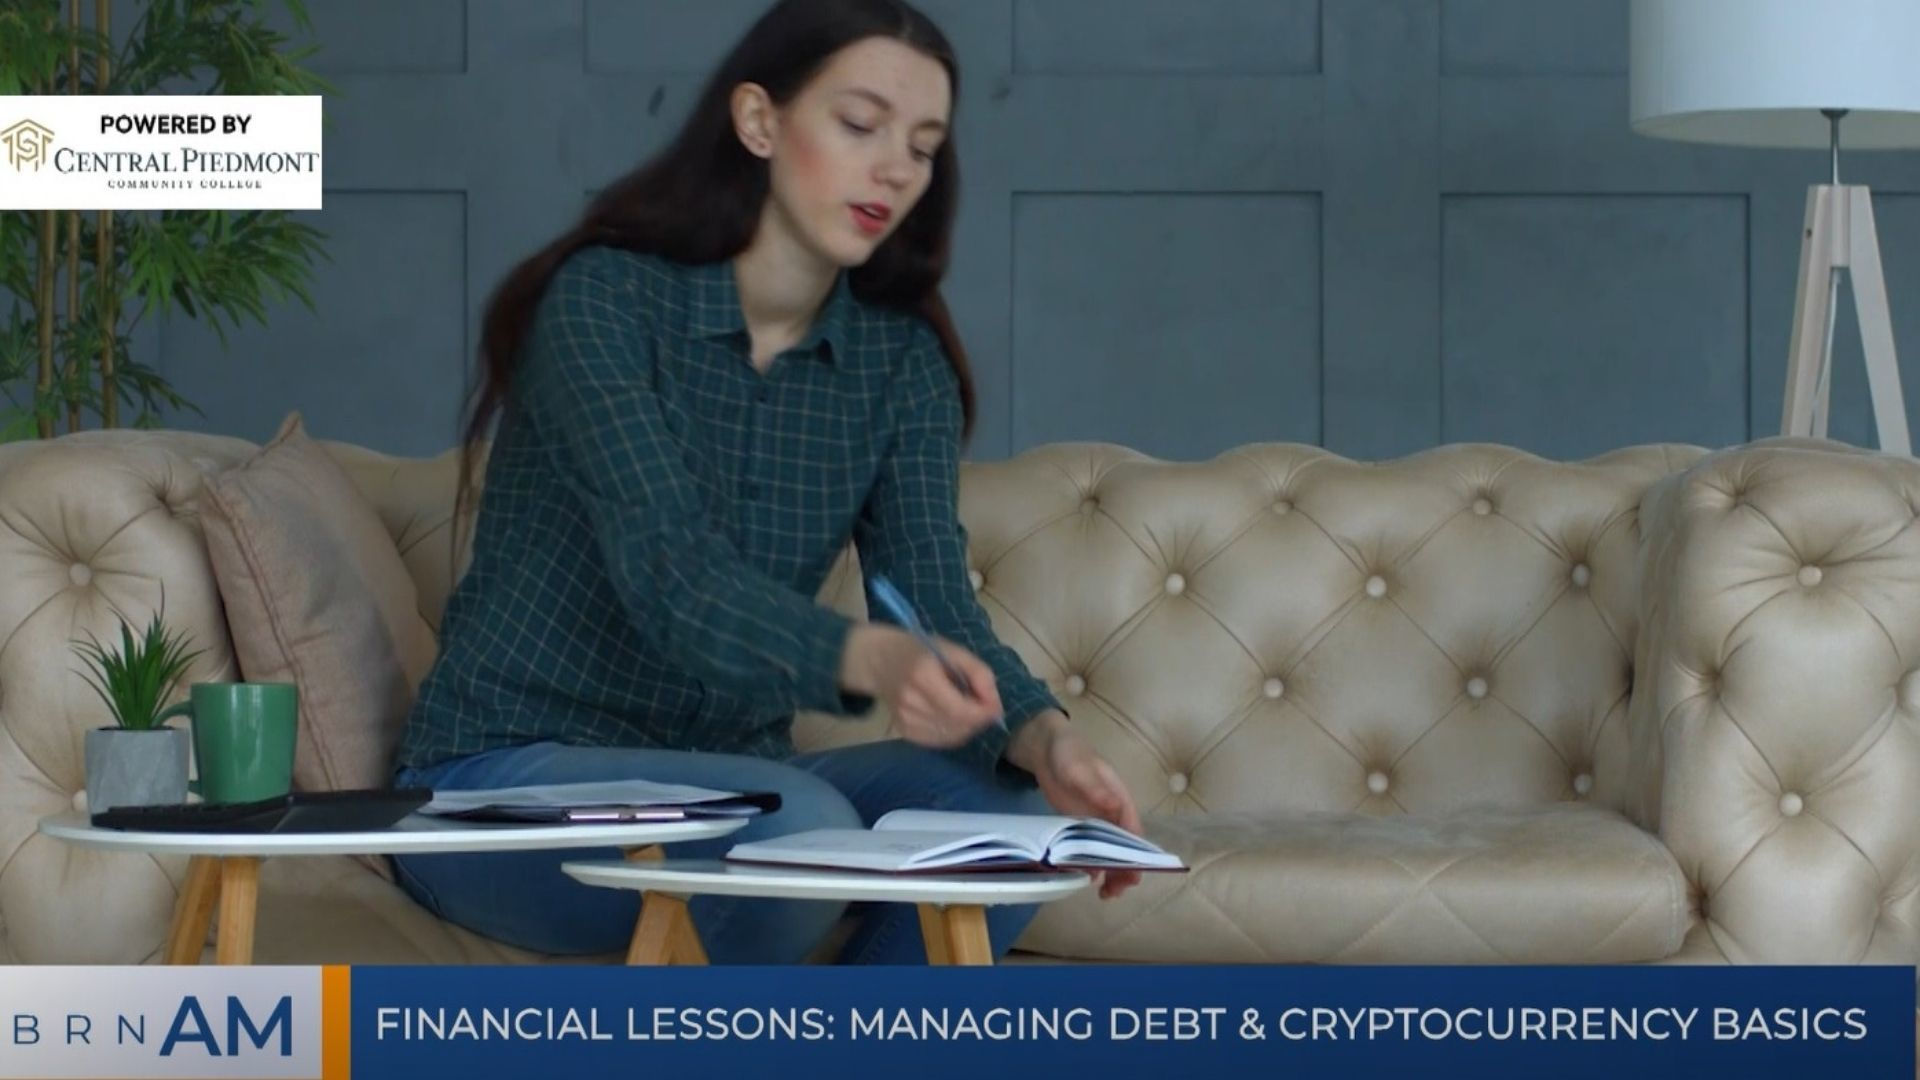 BRN AM   Financial lessons: Managing Debt & Cryptocurrency basics